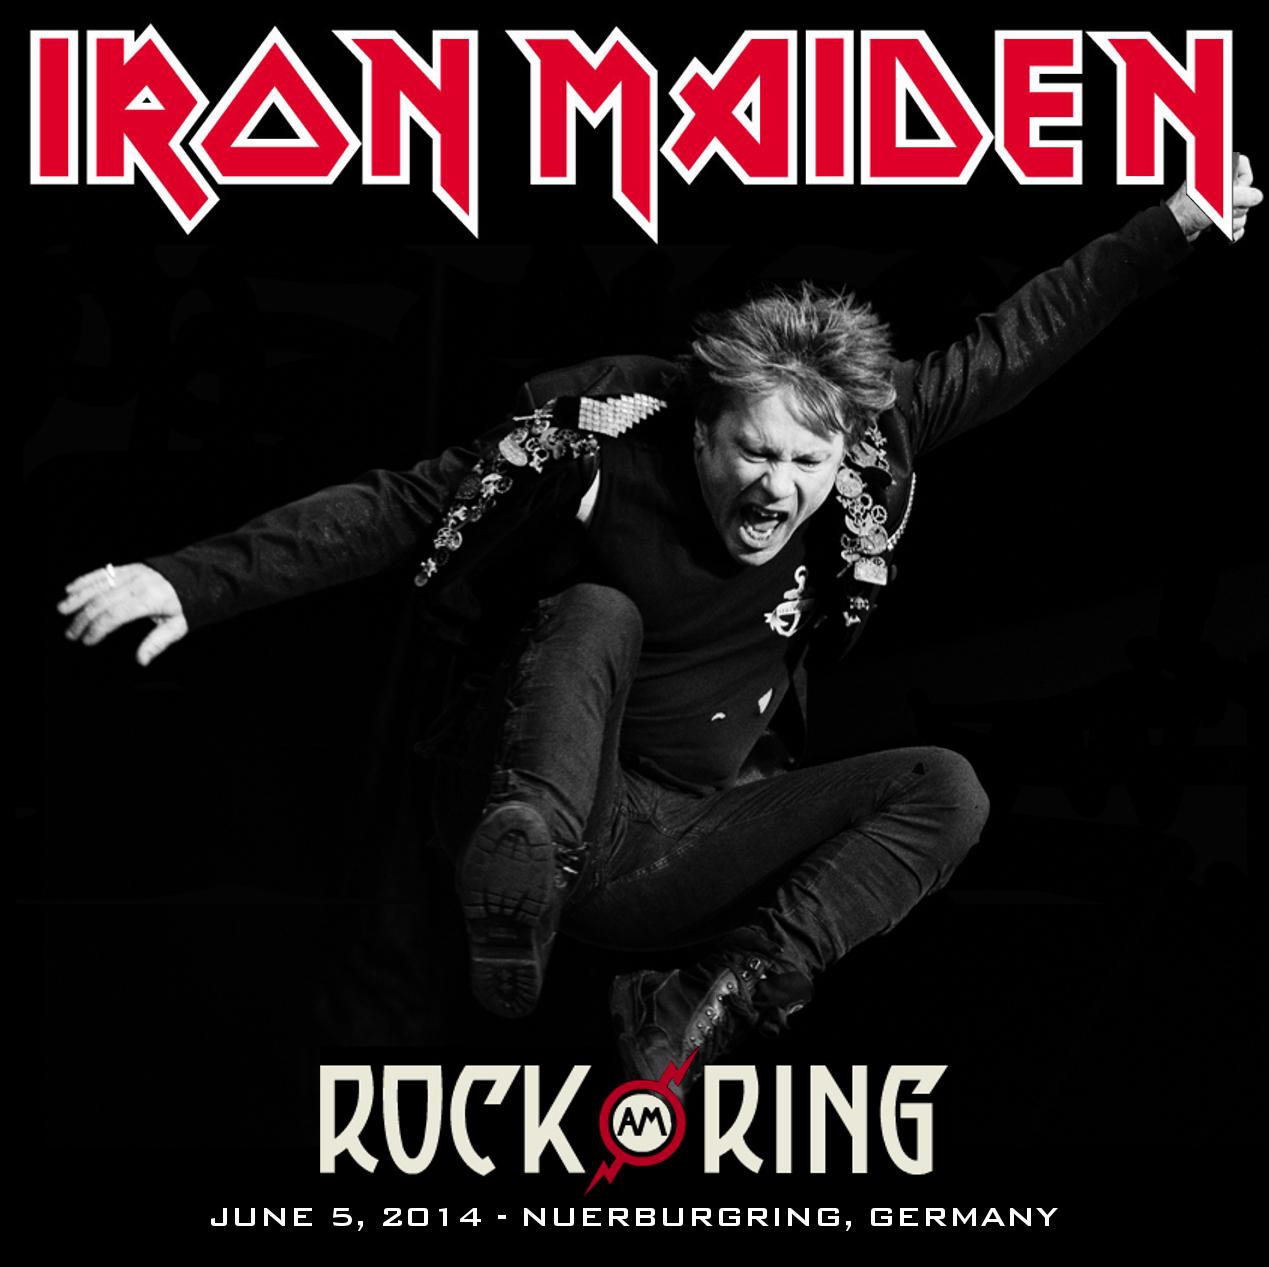 Iron Maiden Va Tour